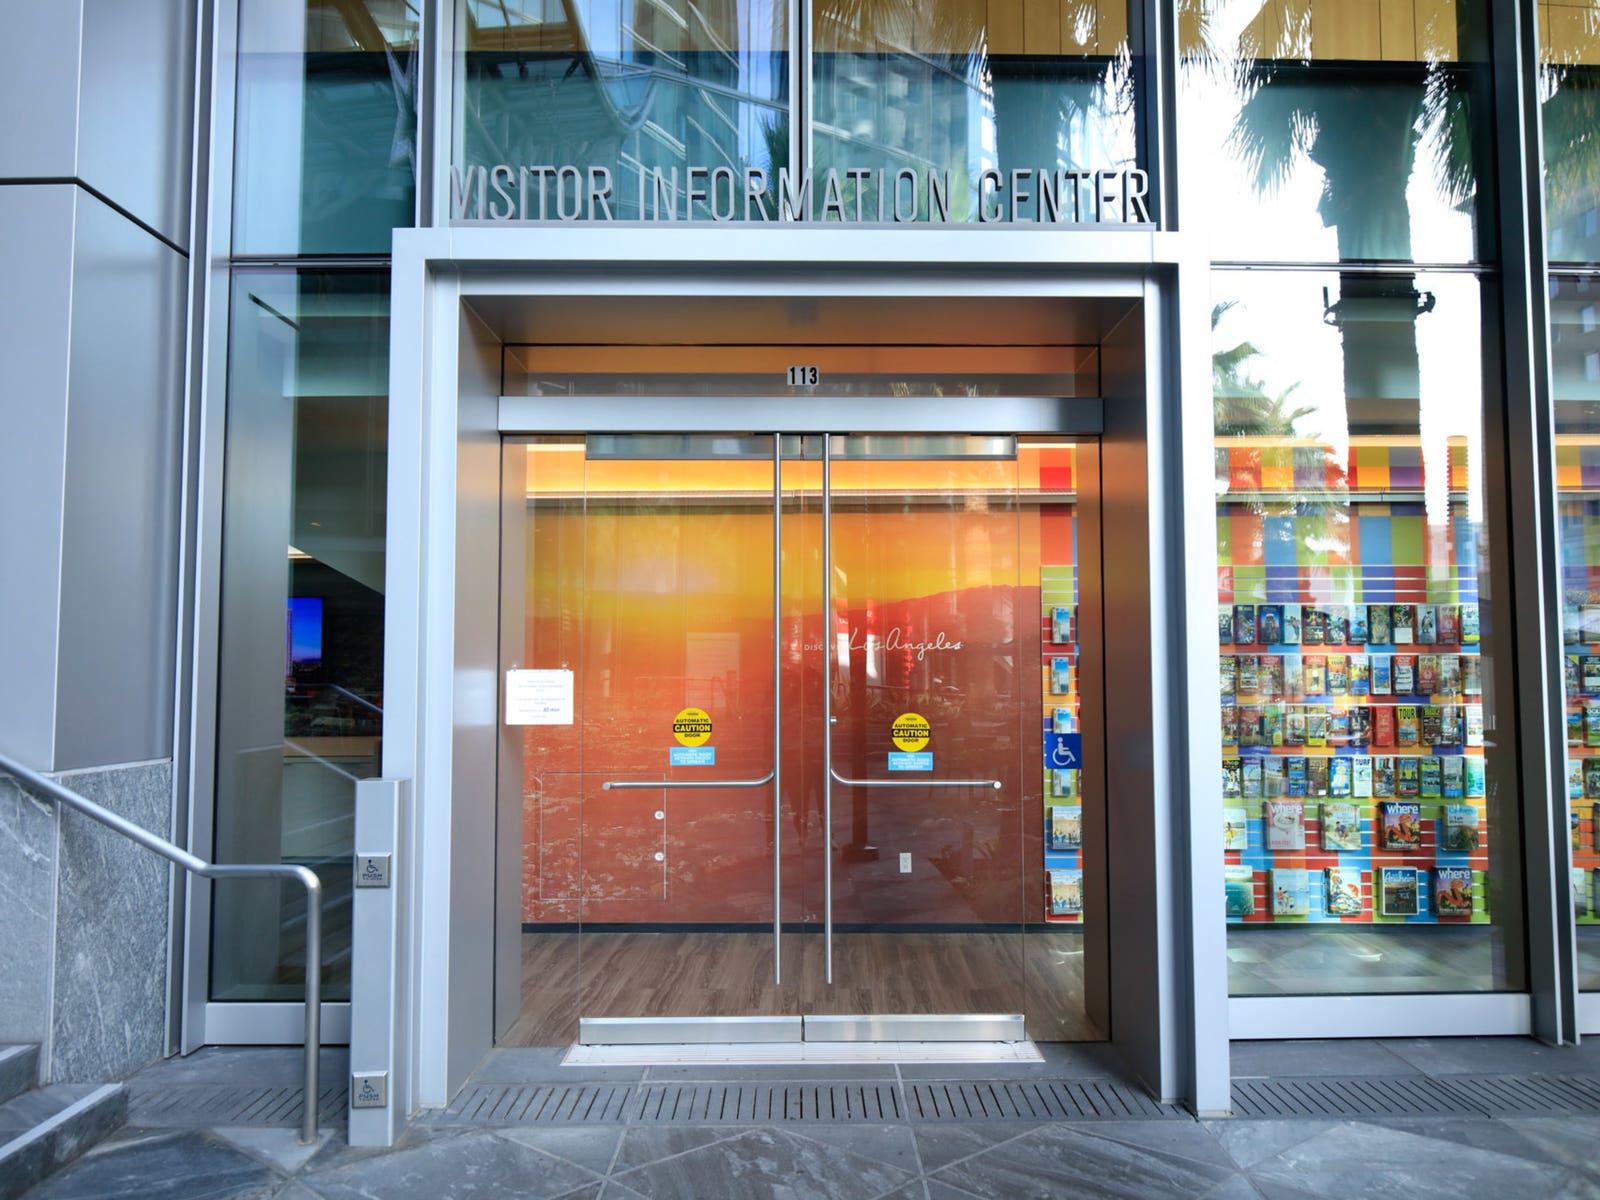 Visitor Information Center 1